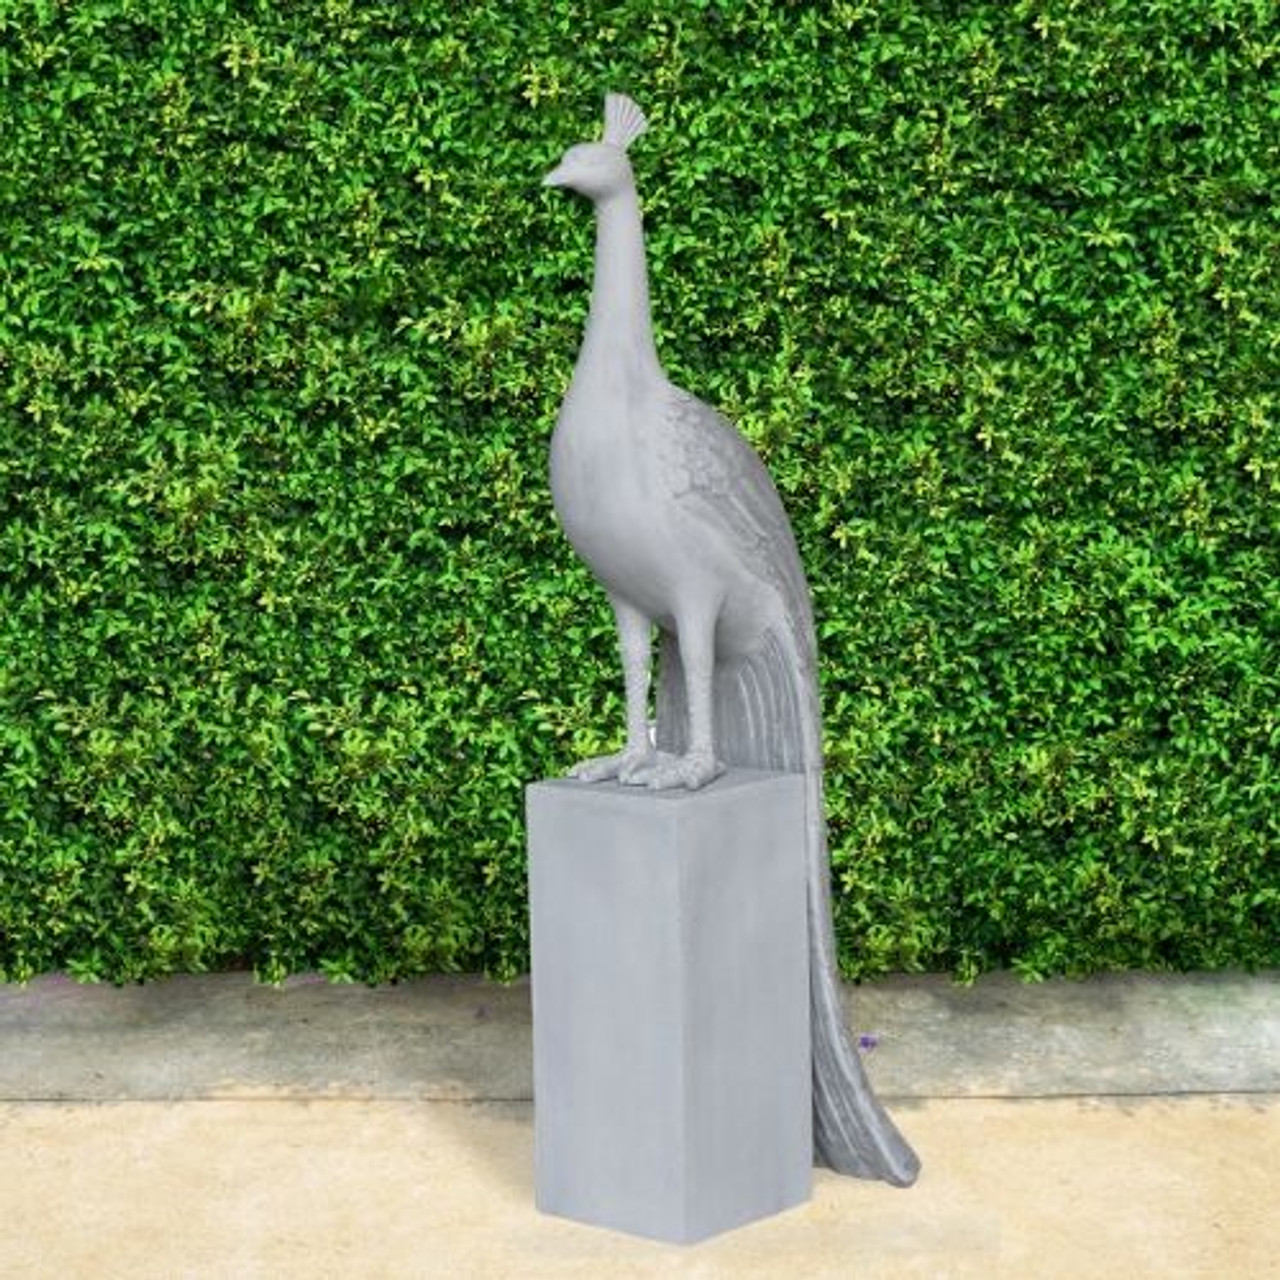 Glamorous Peacock And Pedestal Outdoor Art Polystone Garden Statuary